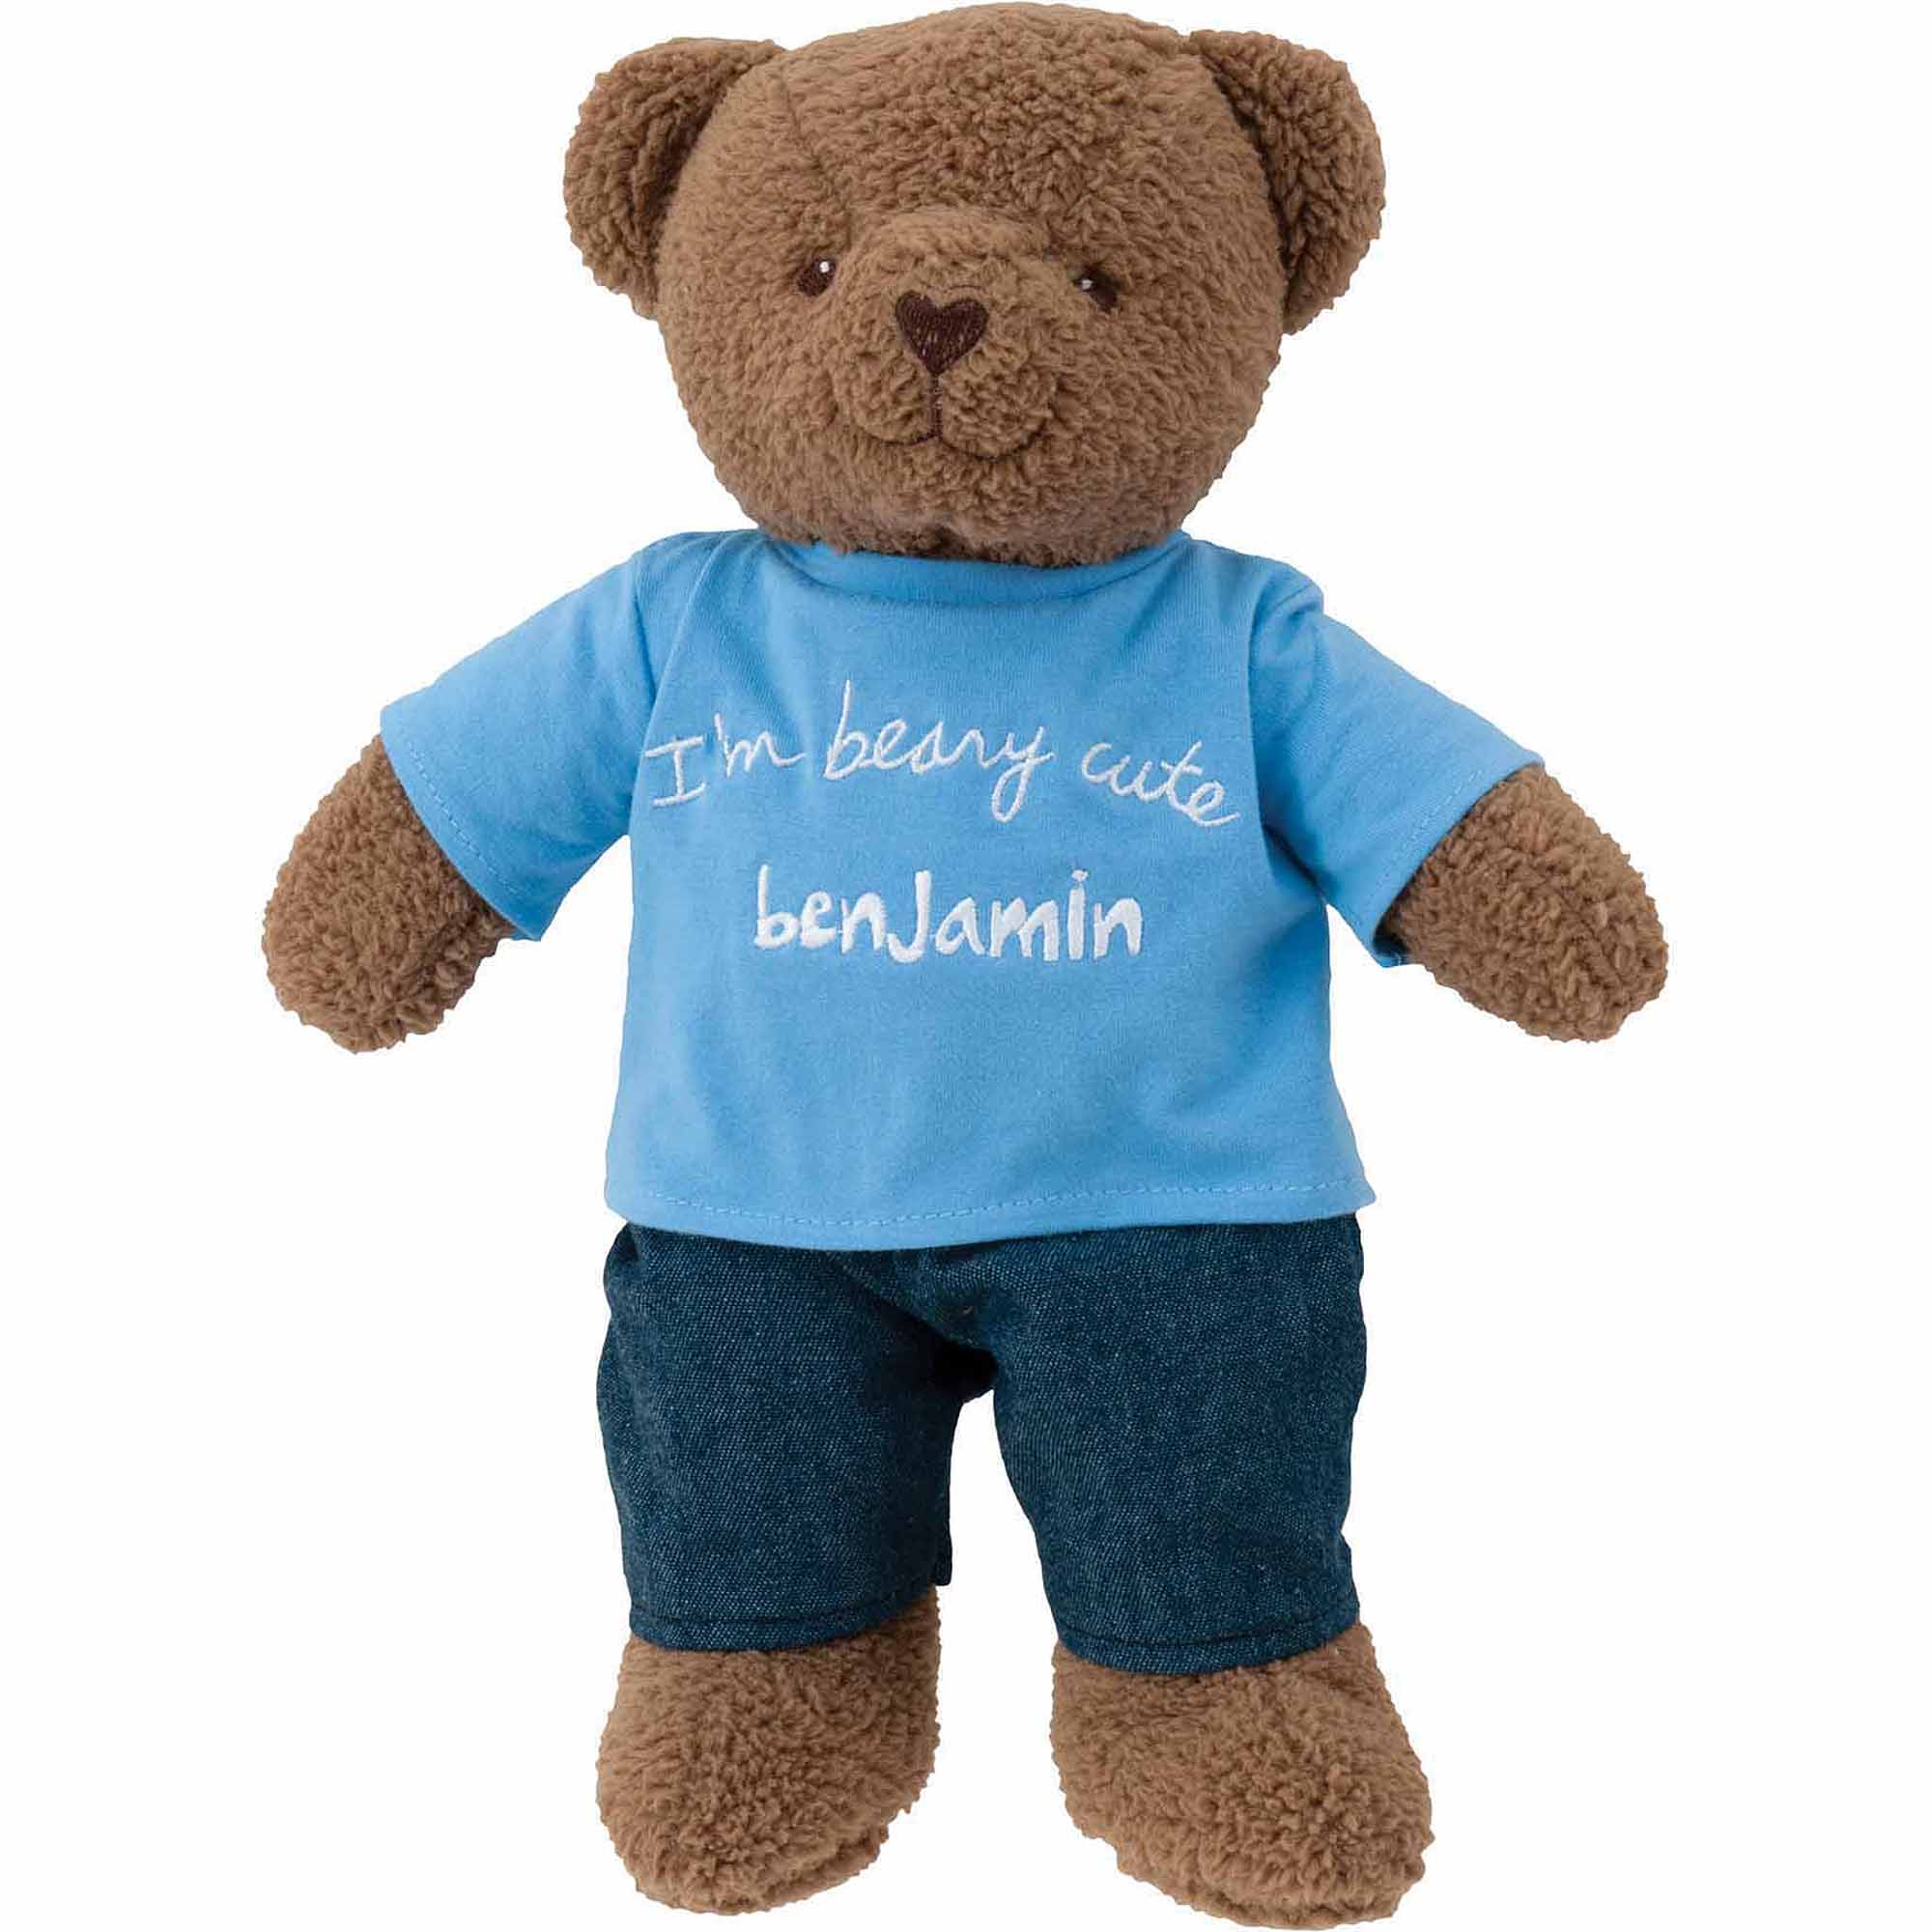 Personalized Sandra Magsamen I'm Beary Cute Teddy Bear